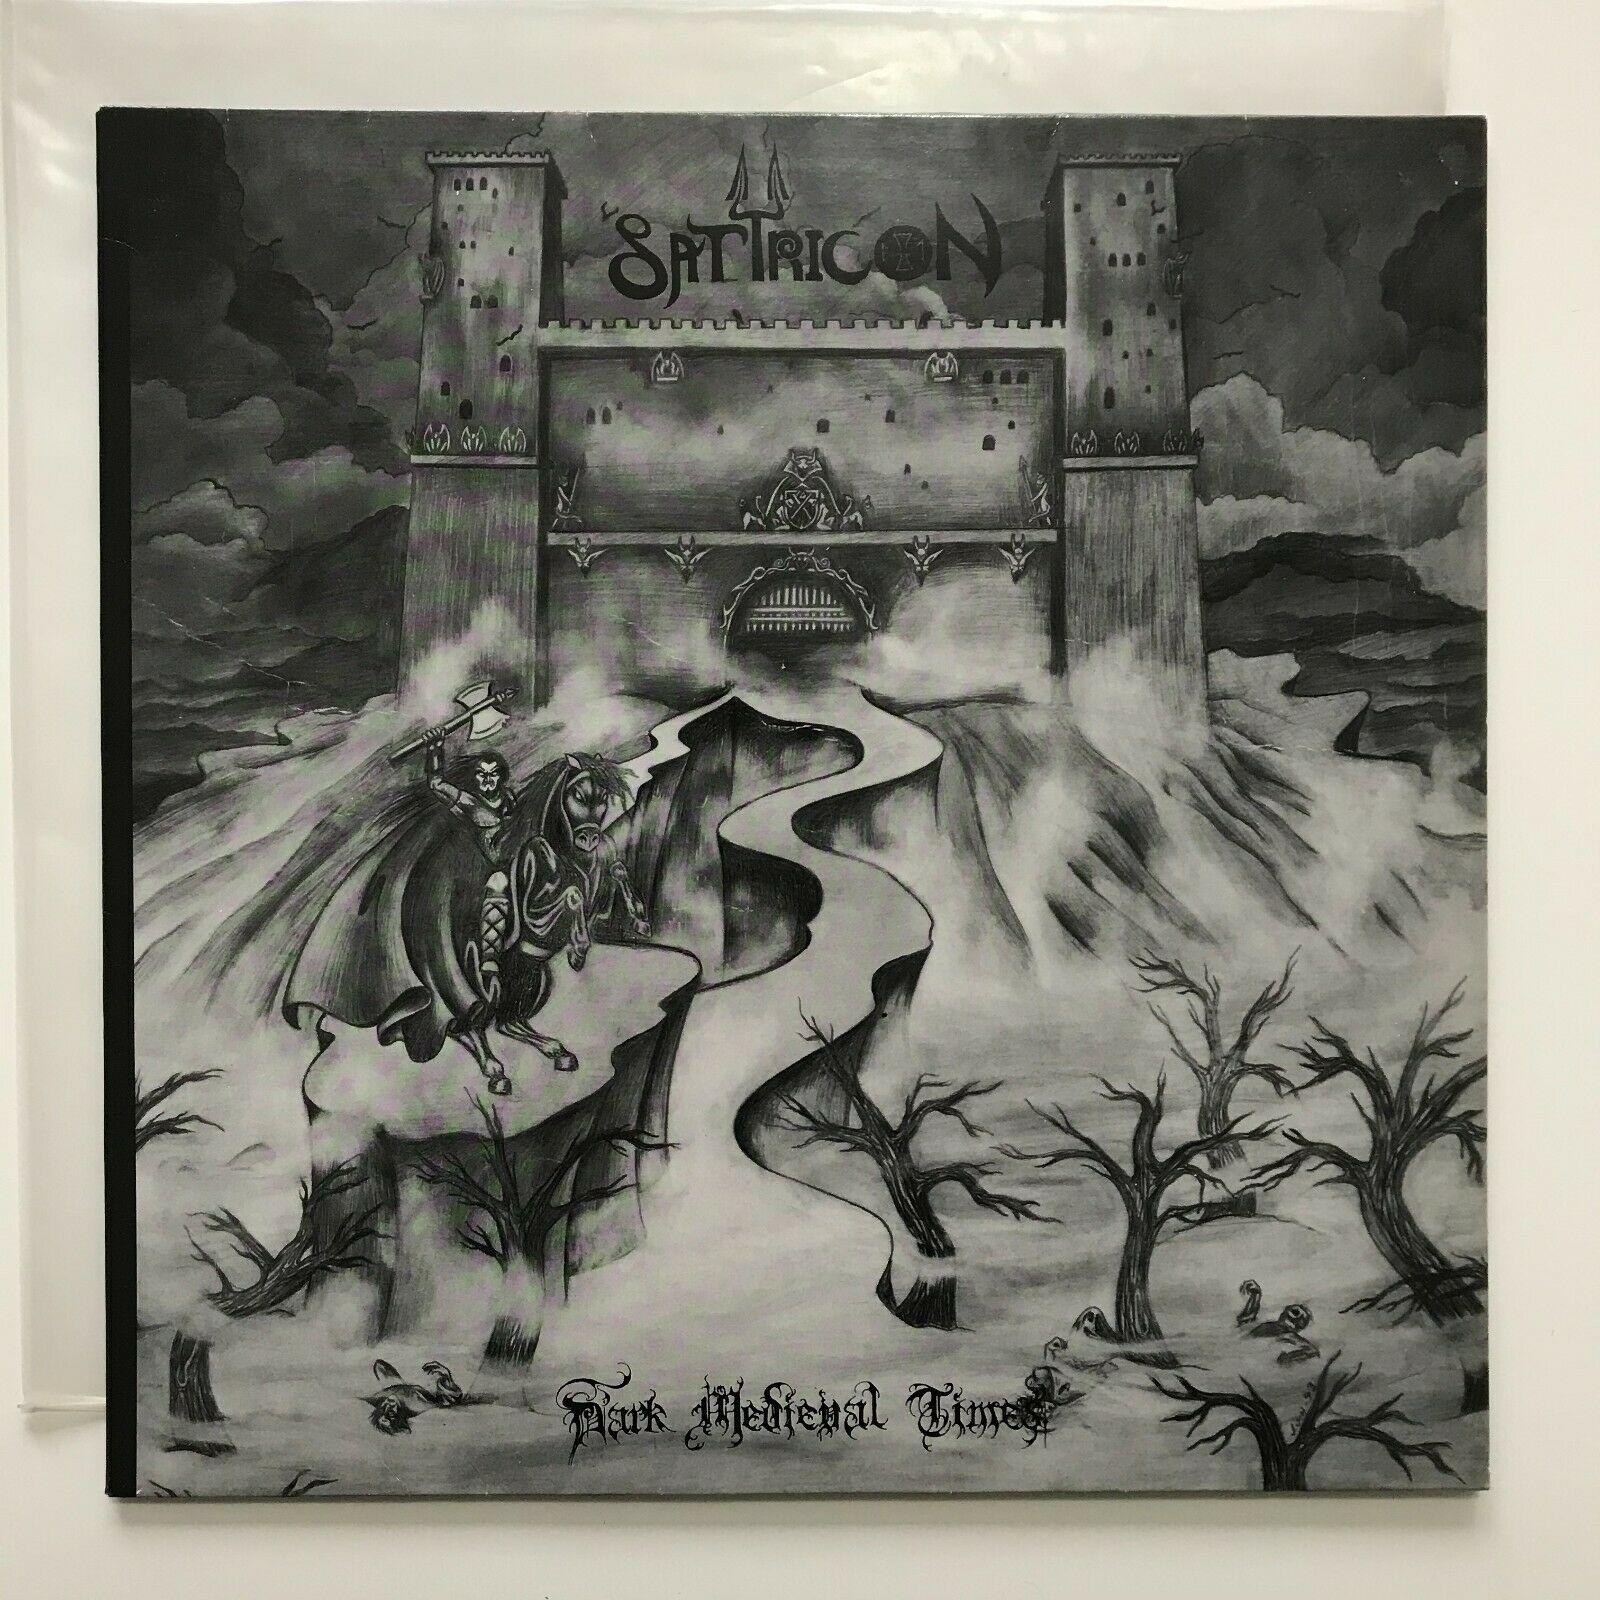 Satyricon Dark medieval times LP 1st press Moonfog 94 SIGNED wongraven storm